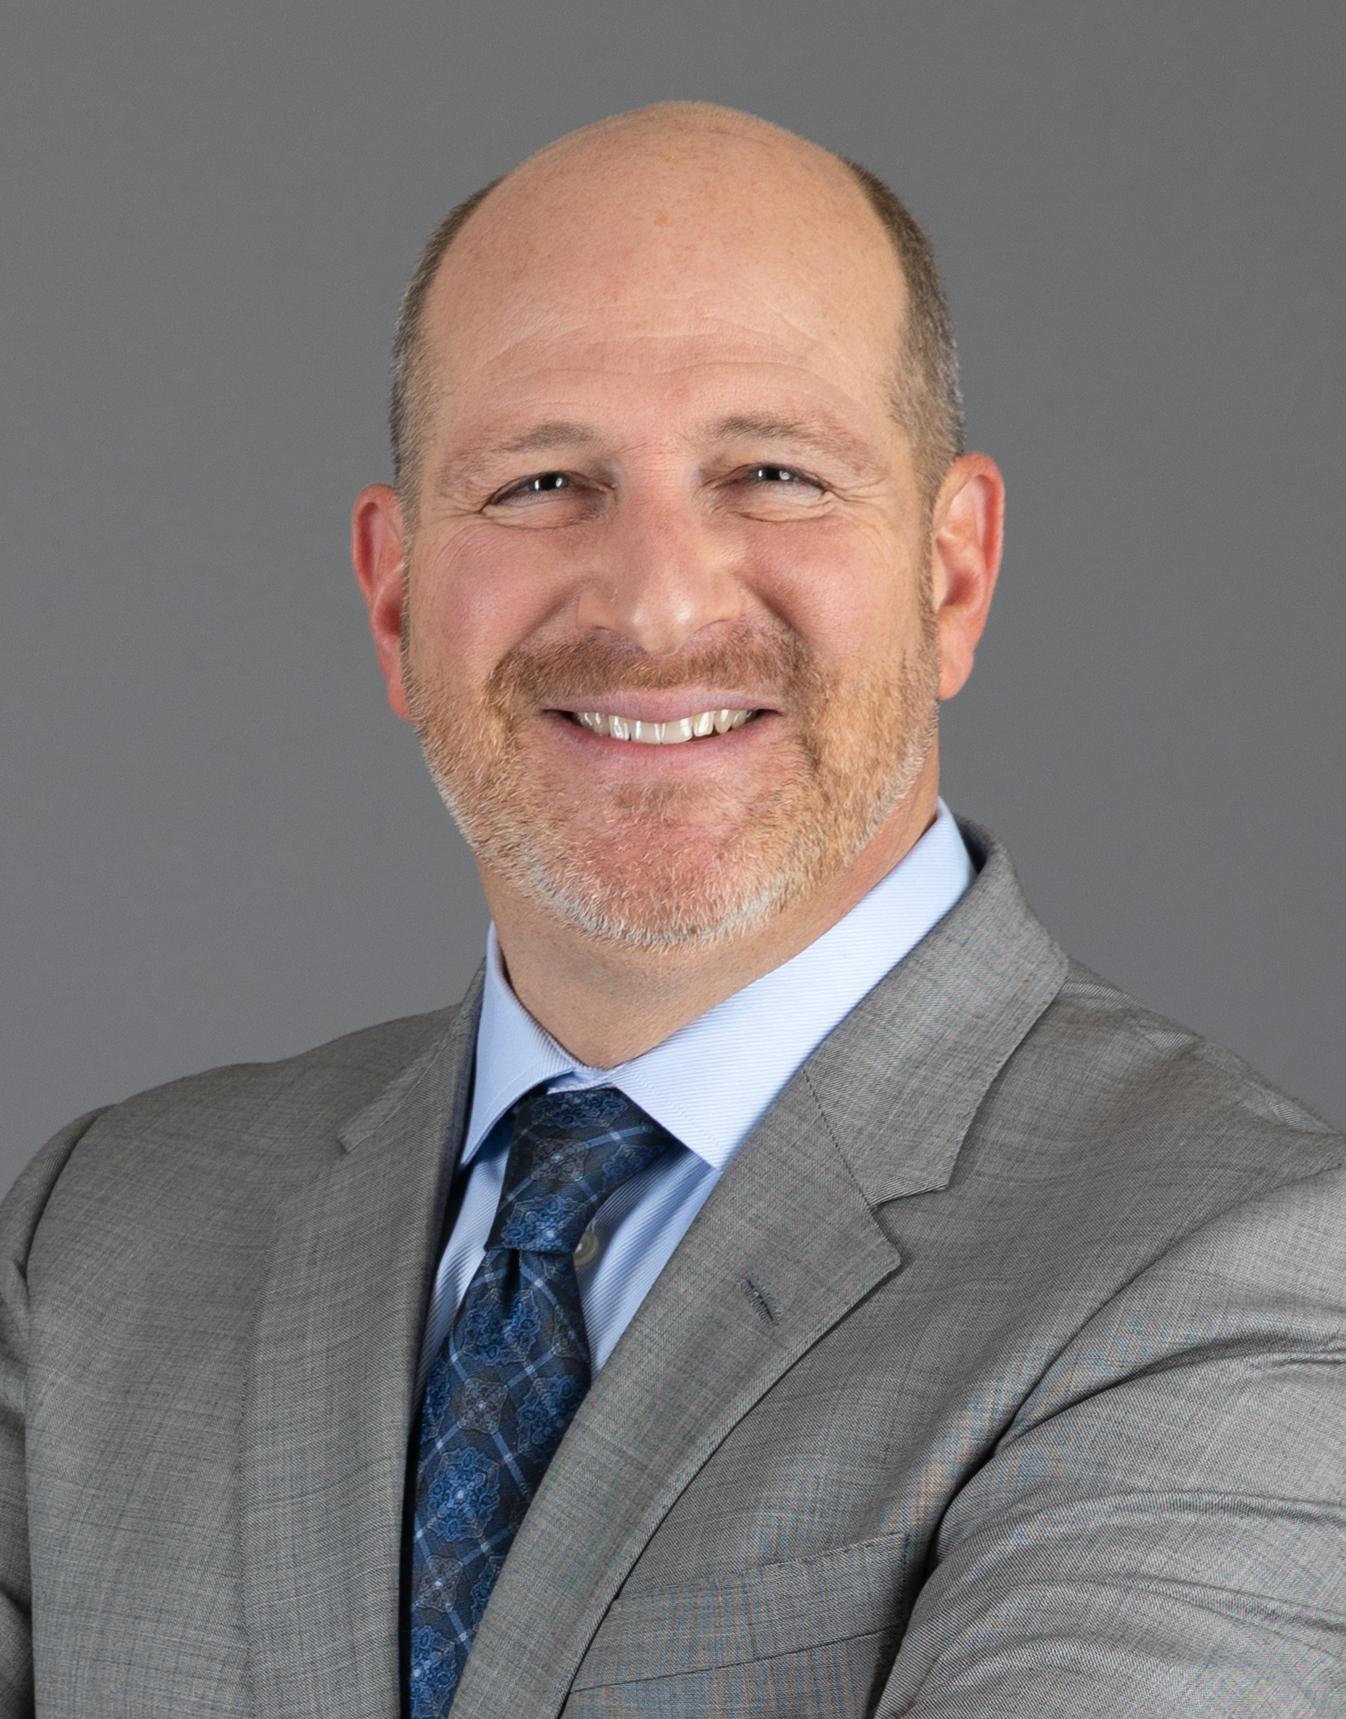 Kevin Margolis